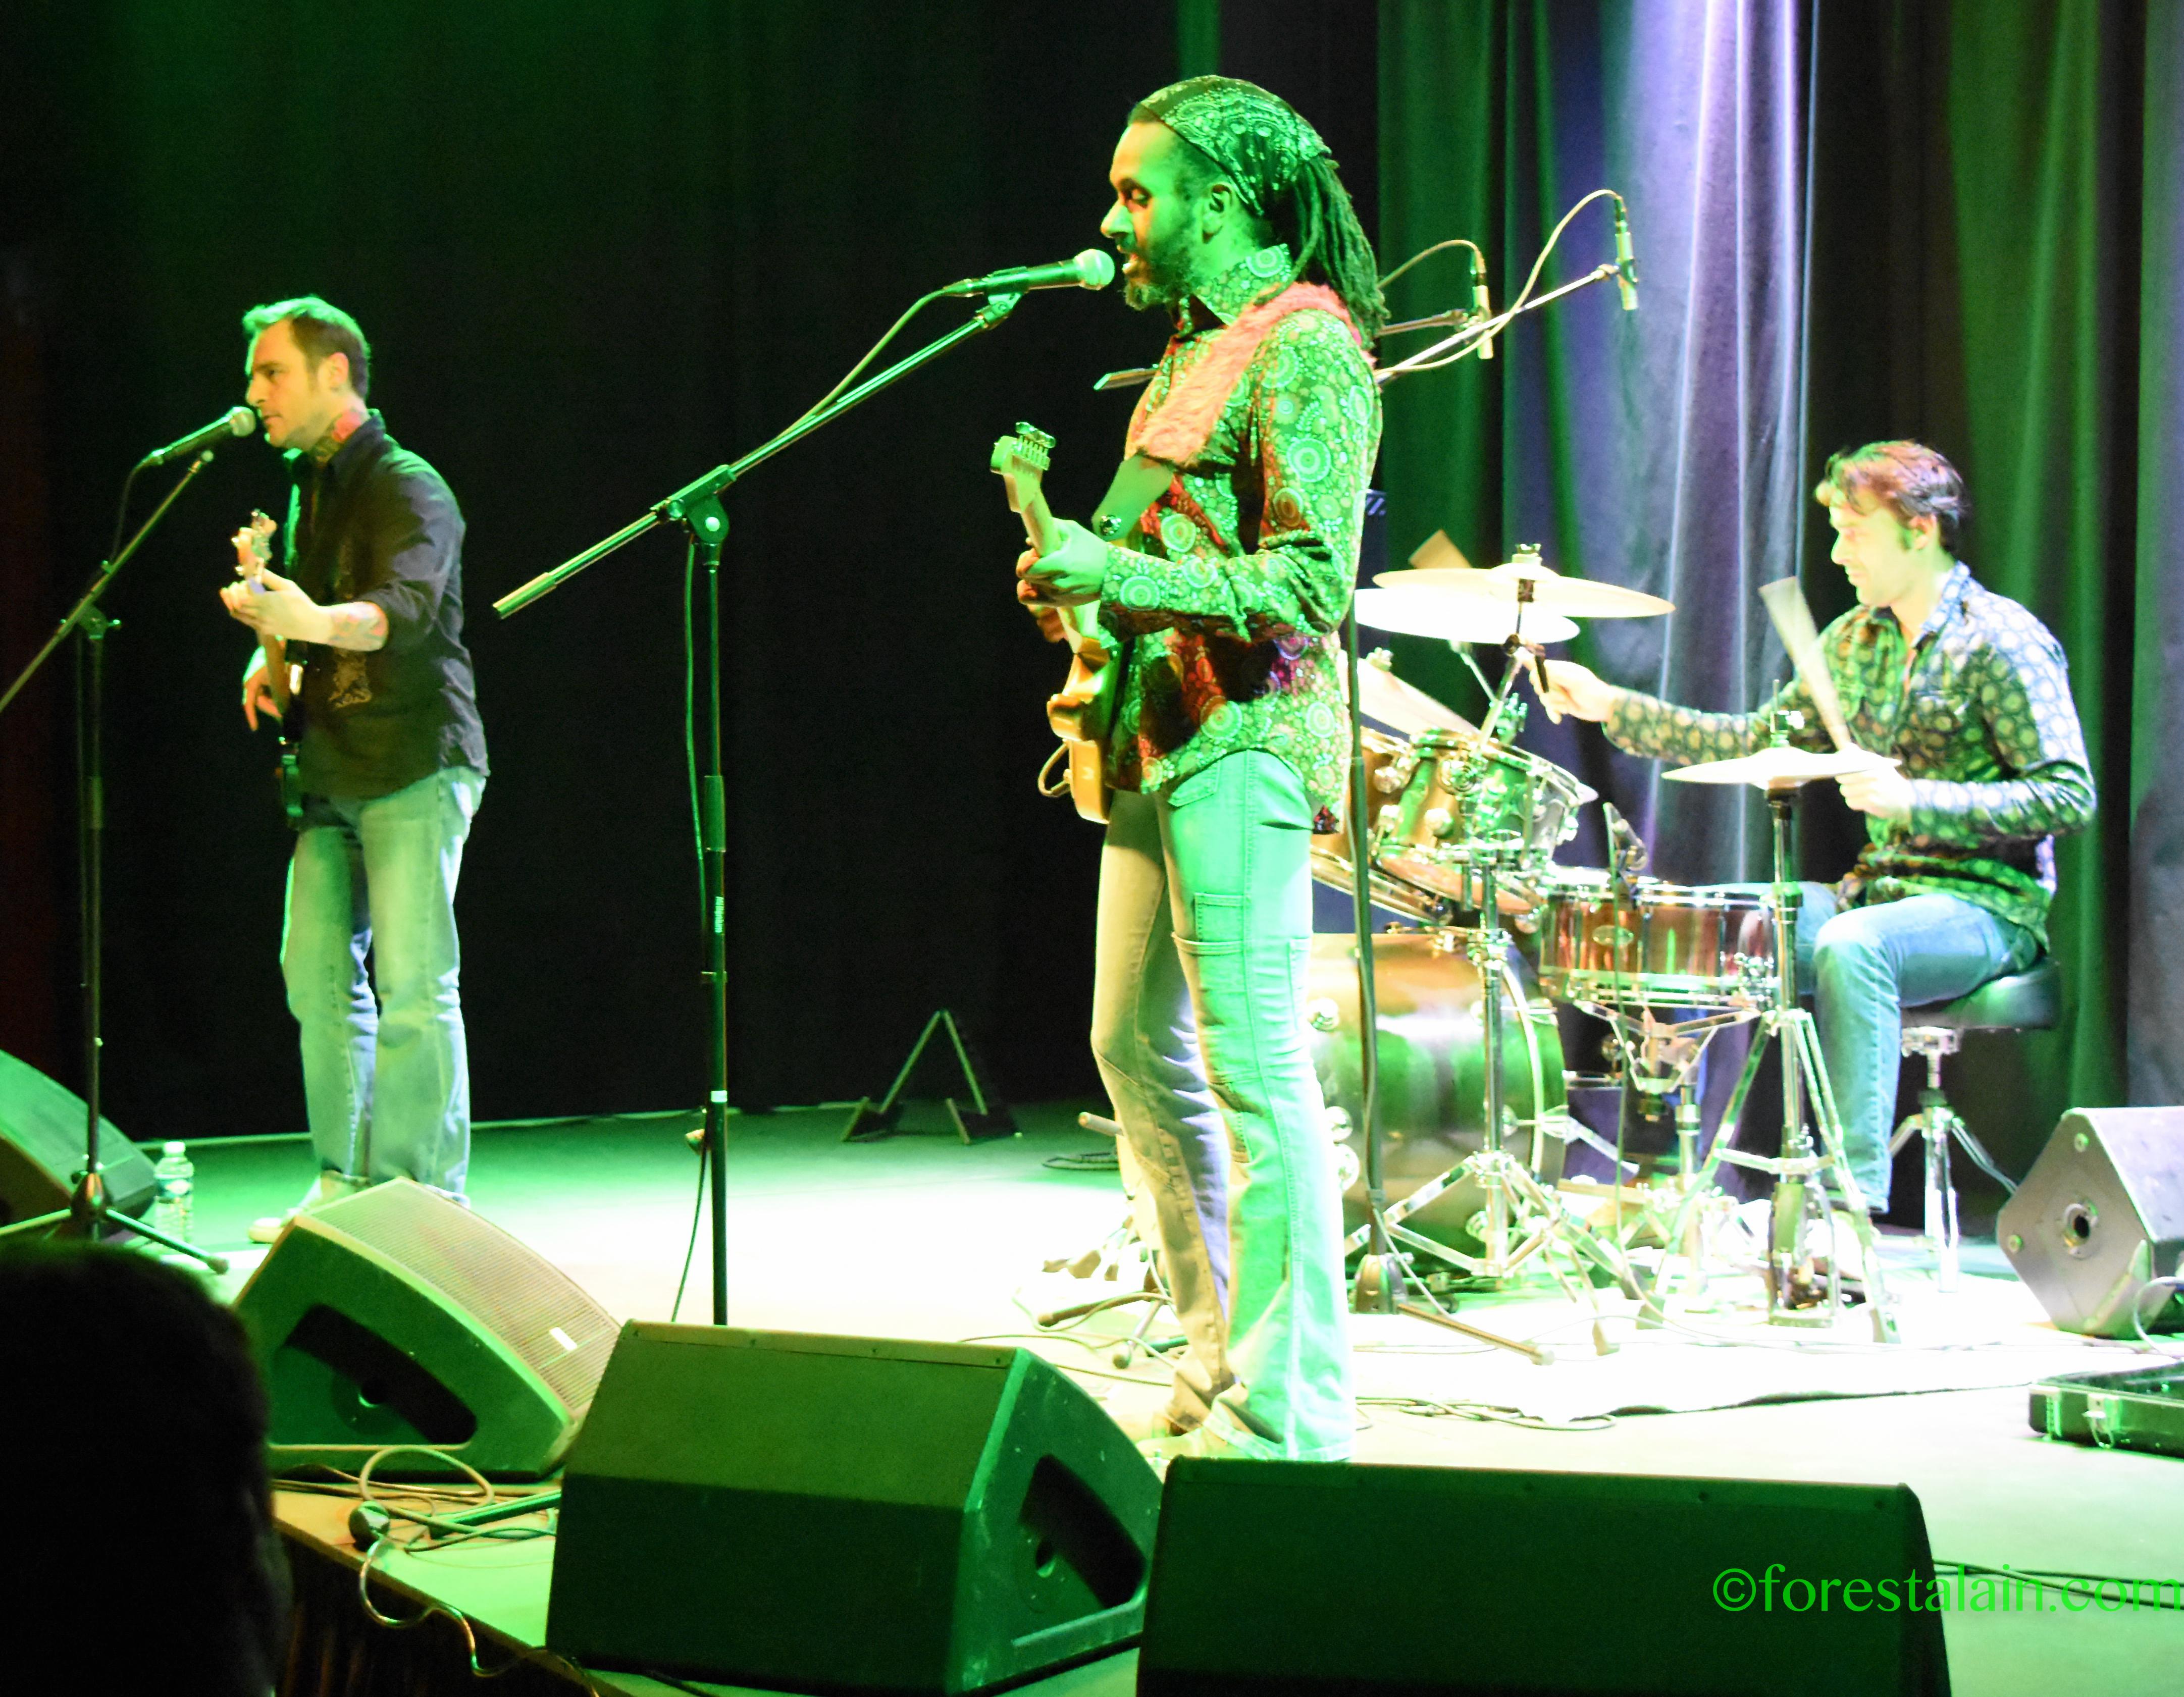 Band of Gypsies Hassan Hajdi/Jean-Christophe Bauer/Benoit Cazzulini